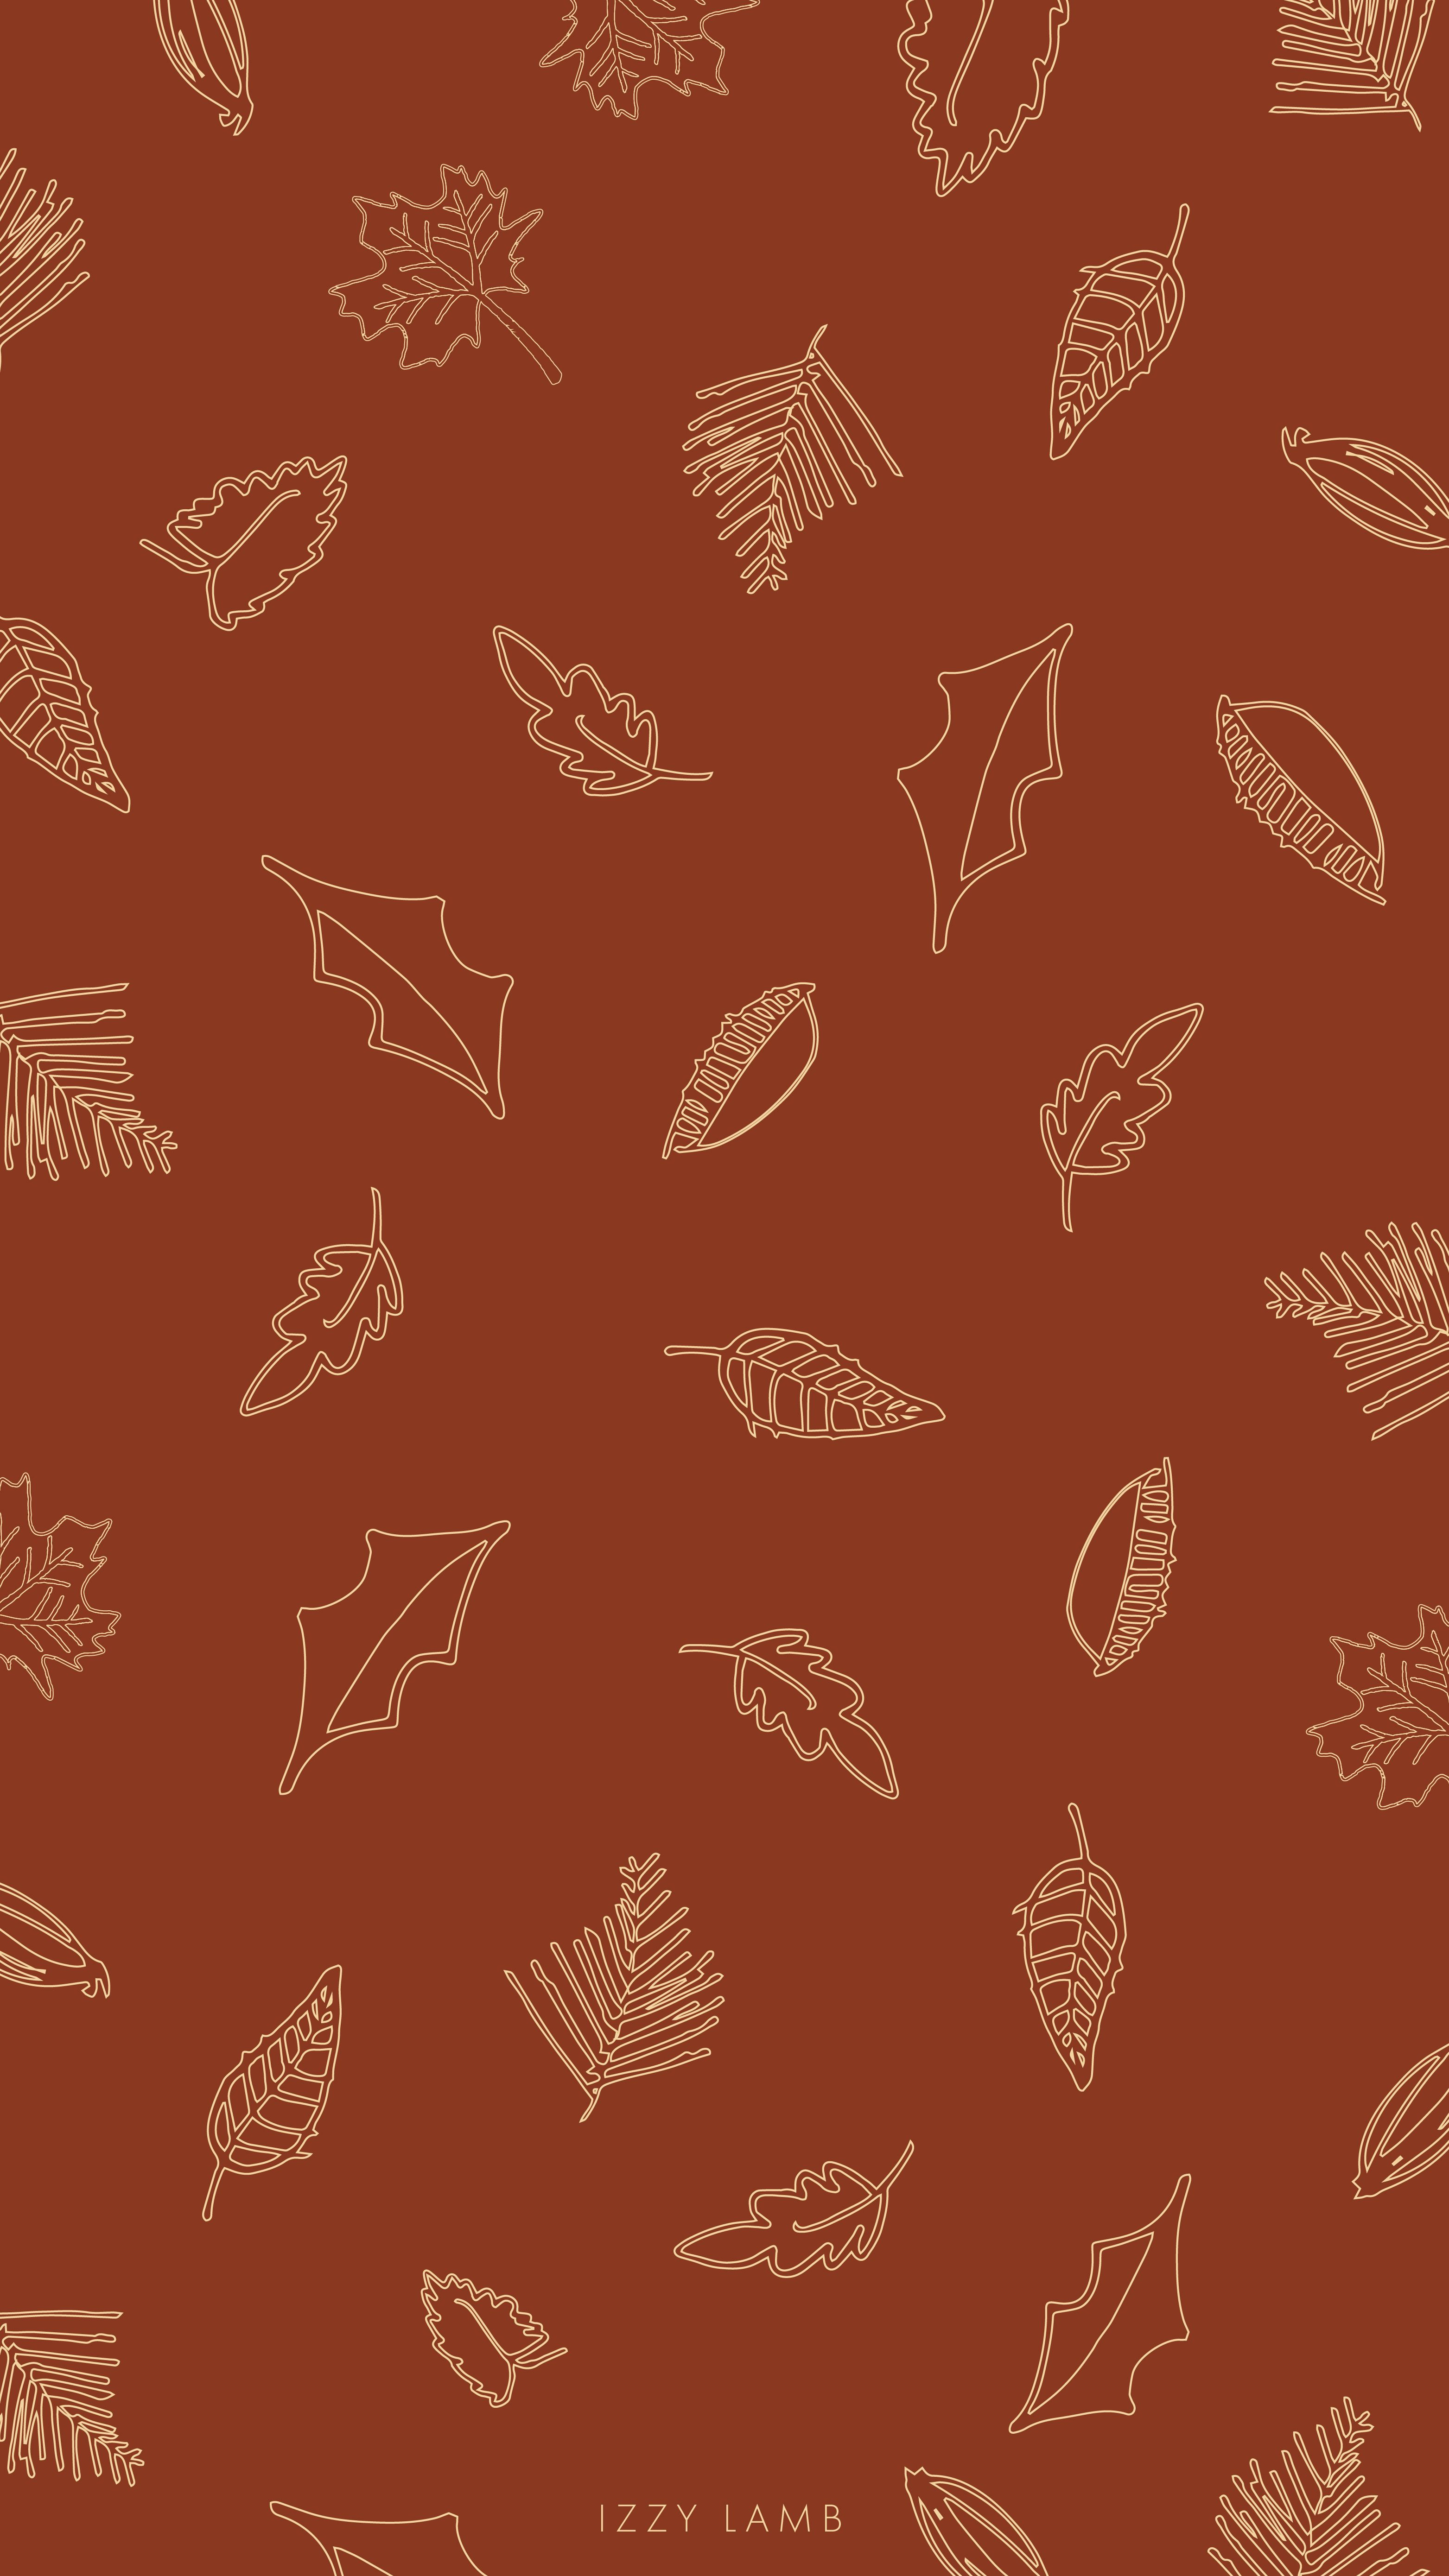 Fall Leaves Iphone Wallpaper Fall Cute Fall Wallpaper Autumn Leaves Wallpaper